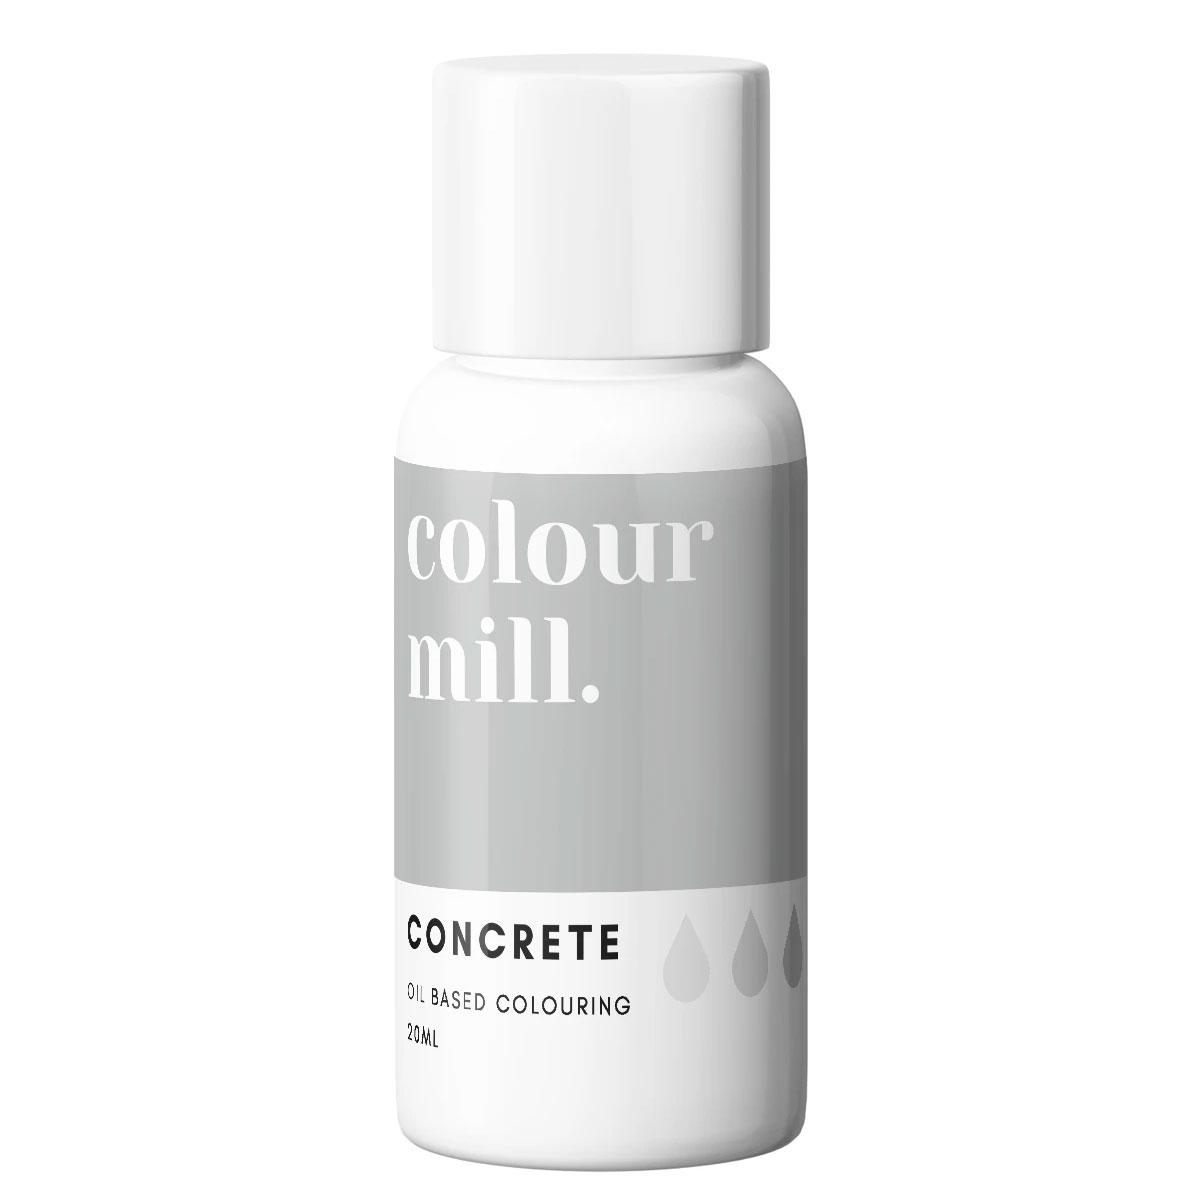 Colour Mill fettlösliche Lebensmittelfarbe - Concrete 20ml